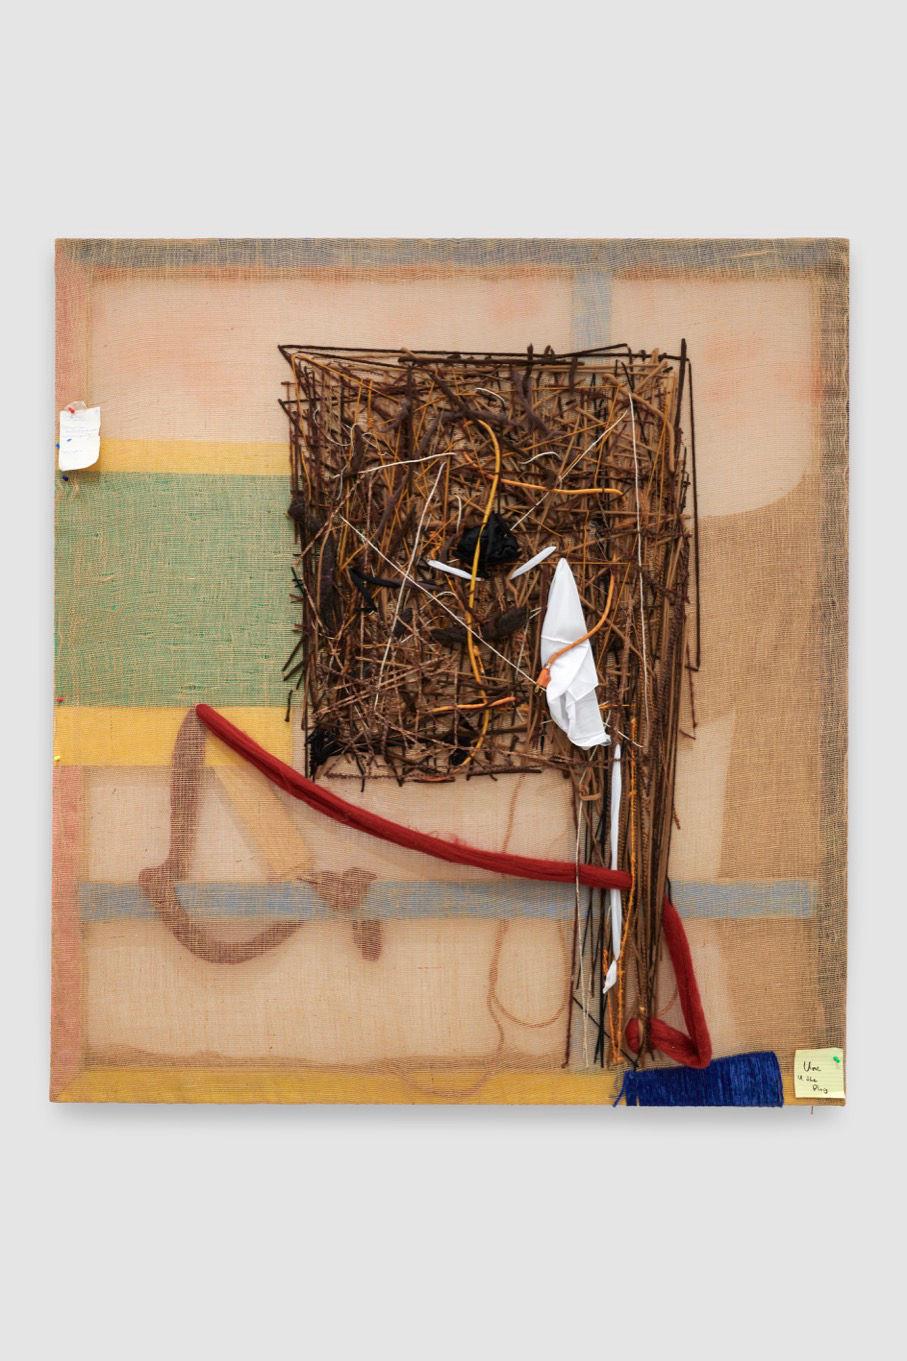 Alvaro Barrington, Unc you the plug, 2019. Mixed media on burlap 182.9 x 167.6 cm (72 x 66 in) Courtesy the artist © Alvaro Barrington